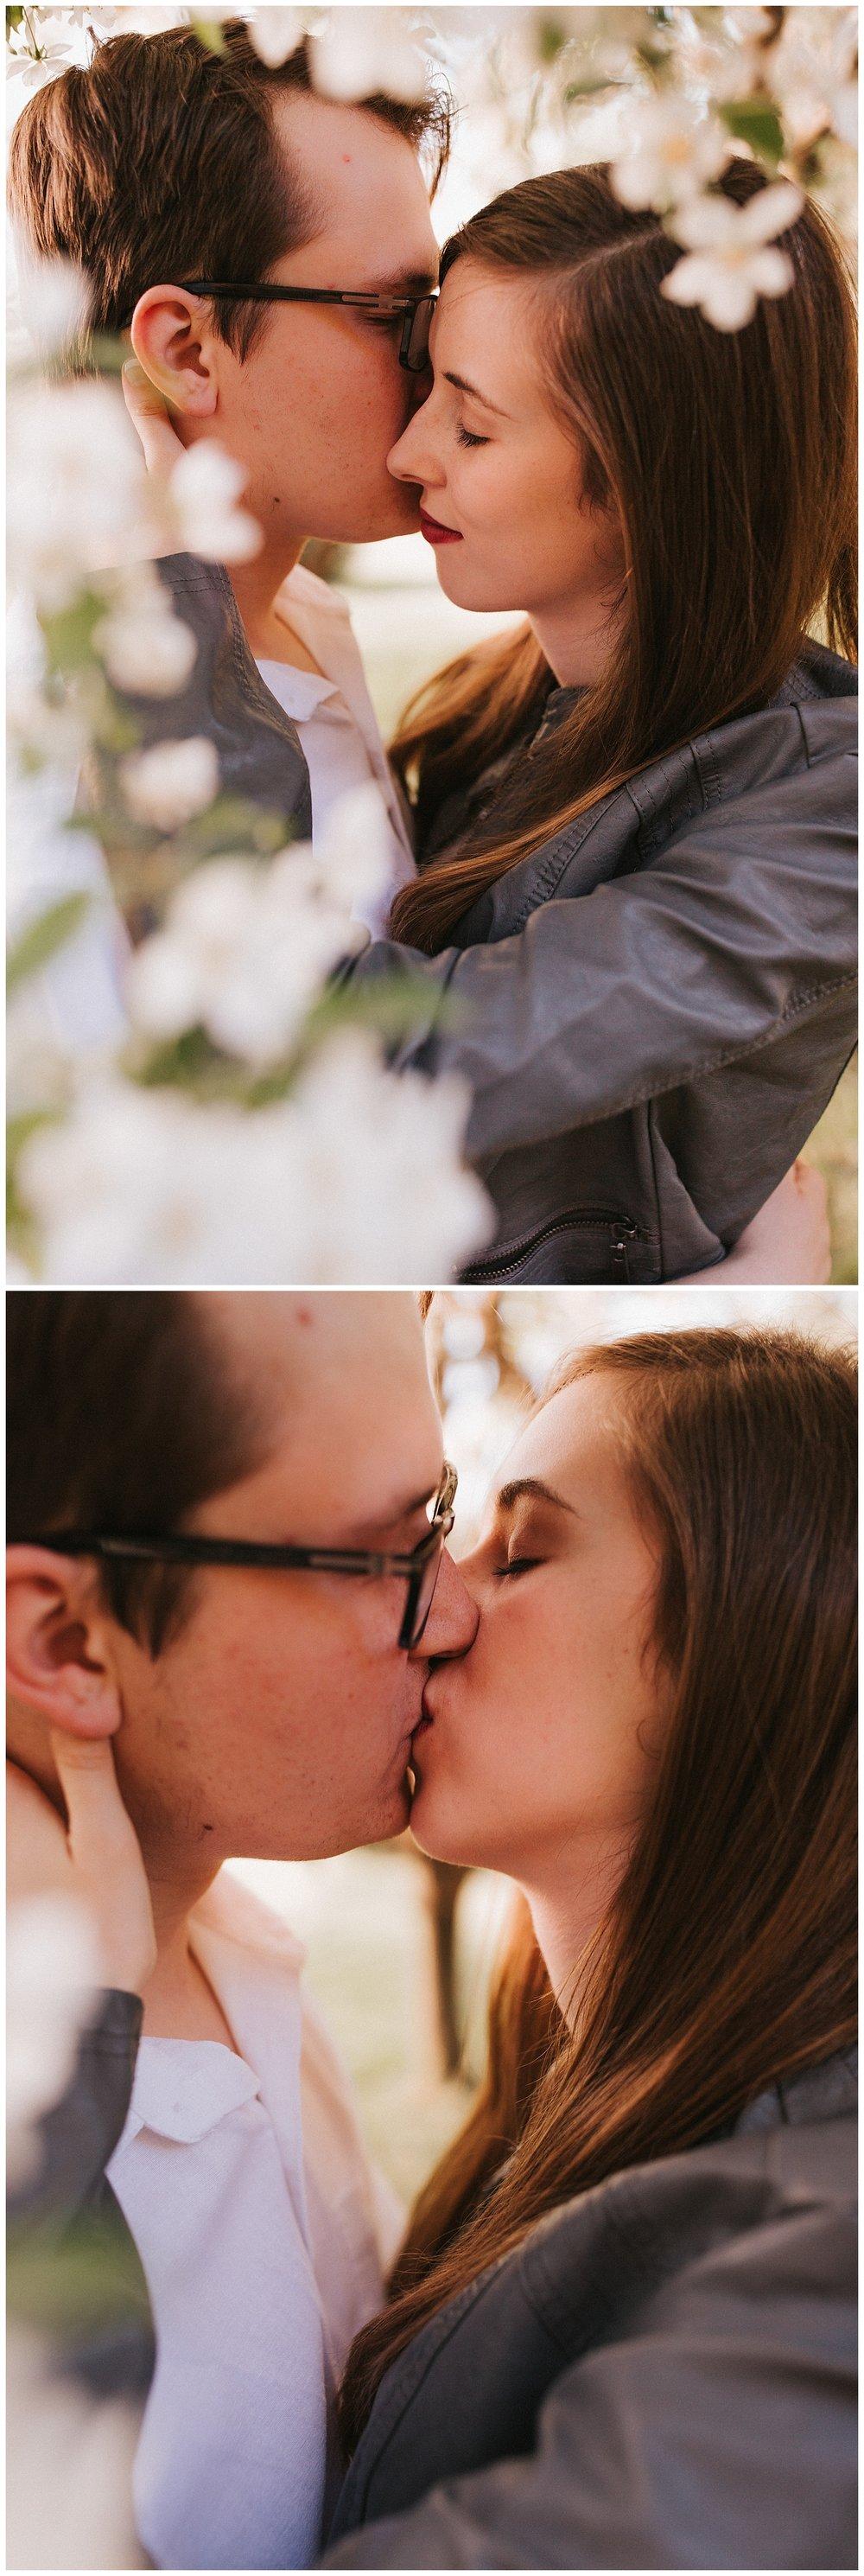 nebraska_cabin_engagement_session_wedding_photographer_adventure_0043.jpg